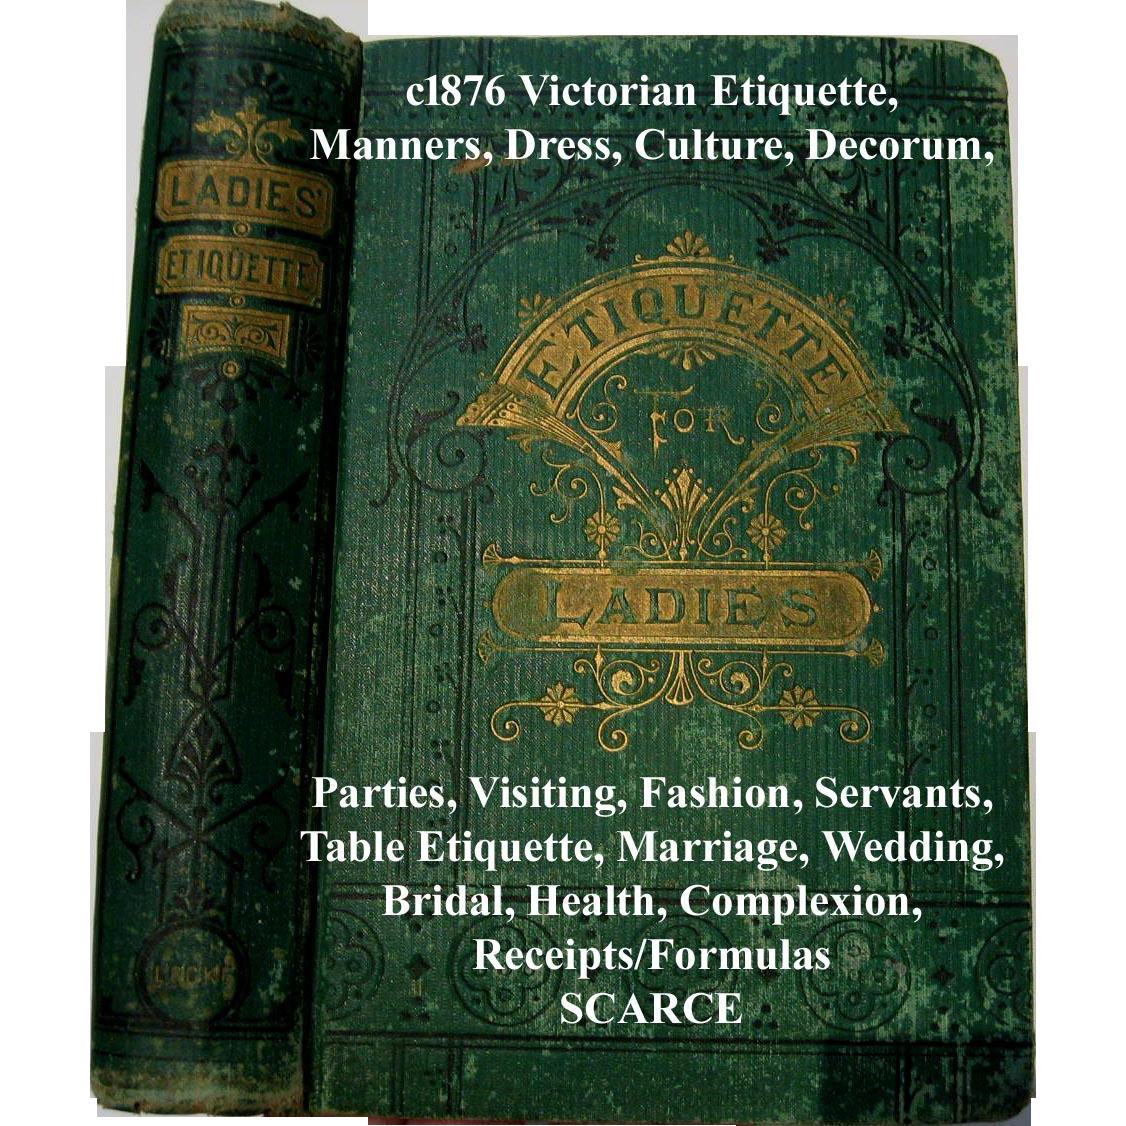 Wedding Gift Receipt Etiquette : ... Etiquette Marriage Wedding Bridal Health Complexion Receipts Formulas